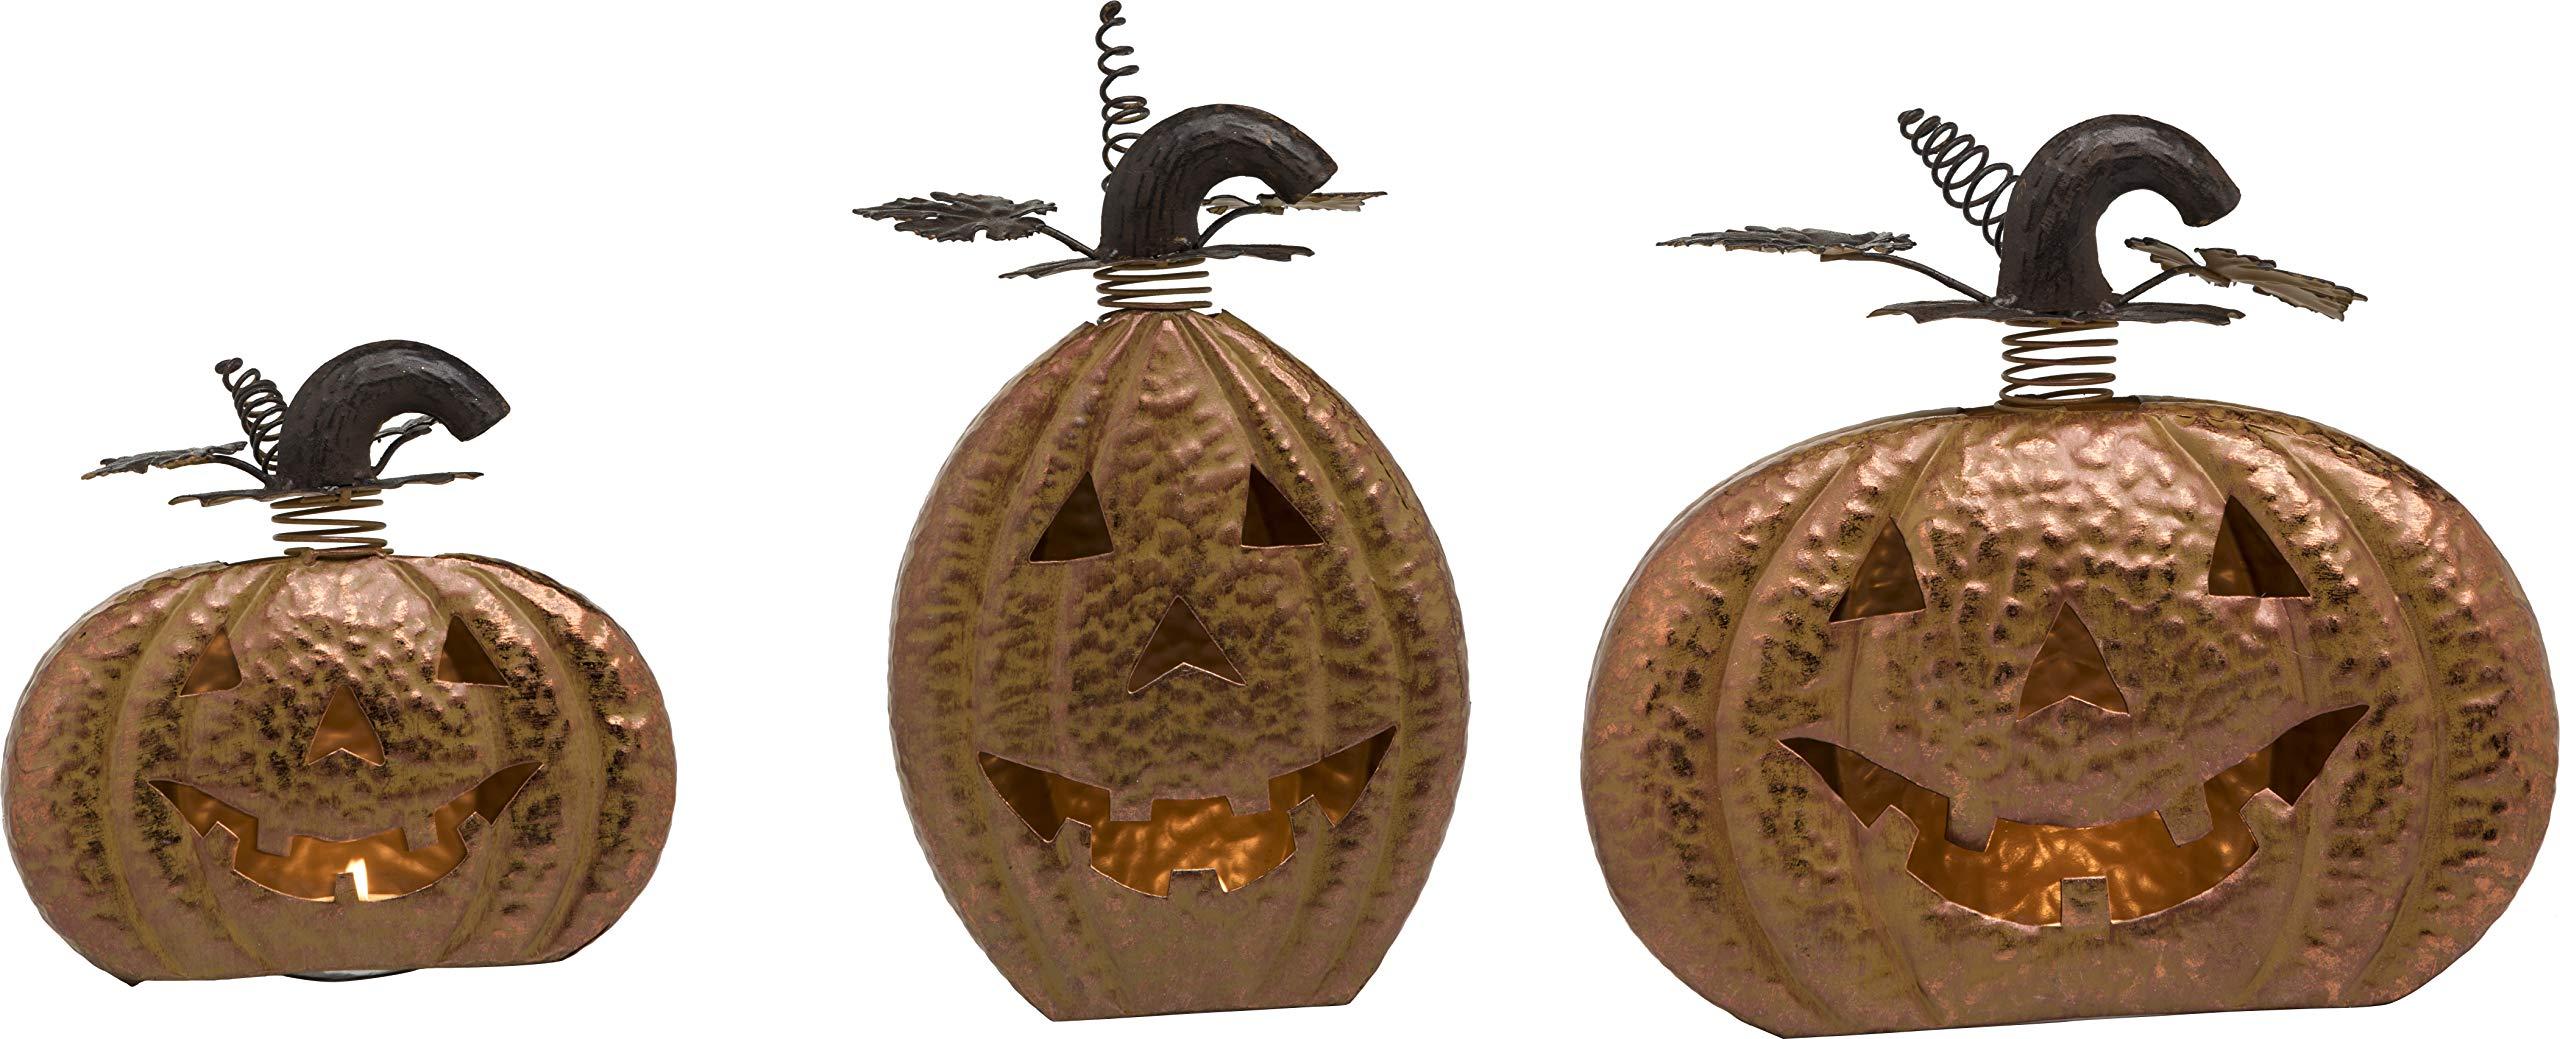 Transpac Imports, Inc. Classic Jack-O-Lantern Bronze 13 x 11 Tin Halloween Tea Light Holders Set of 3